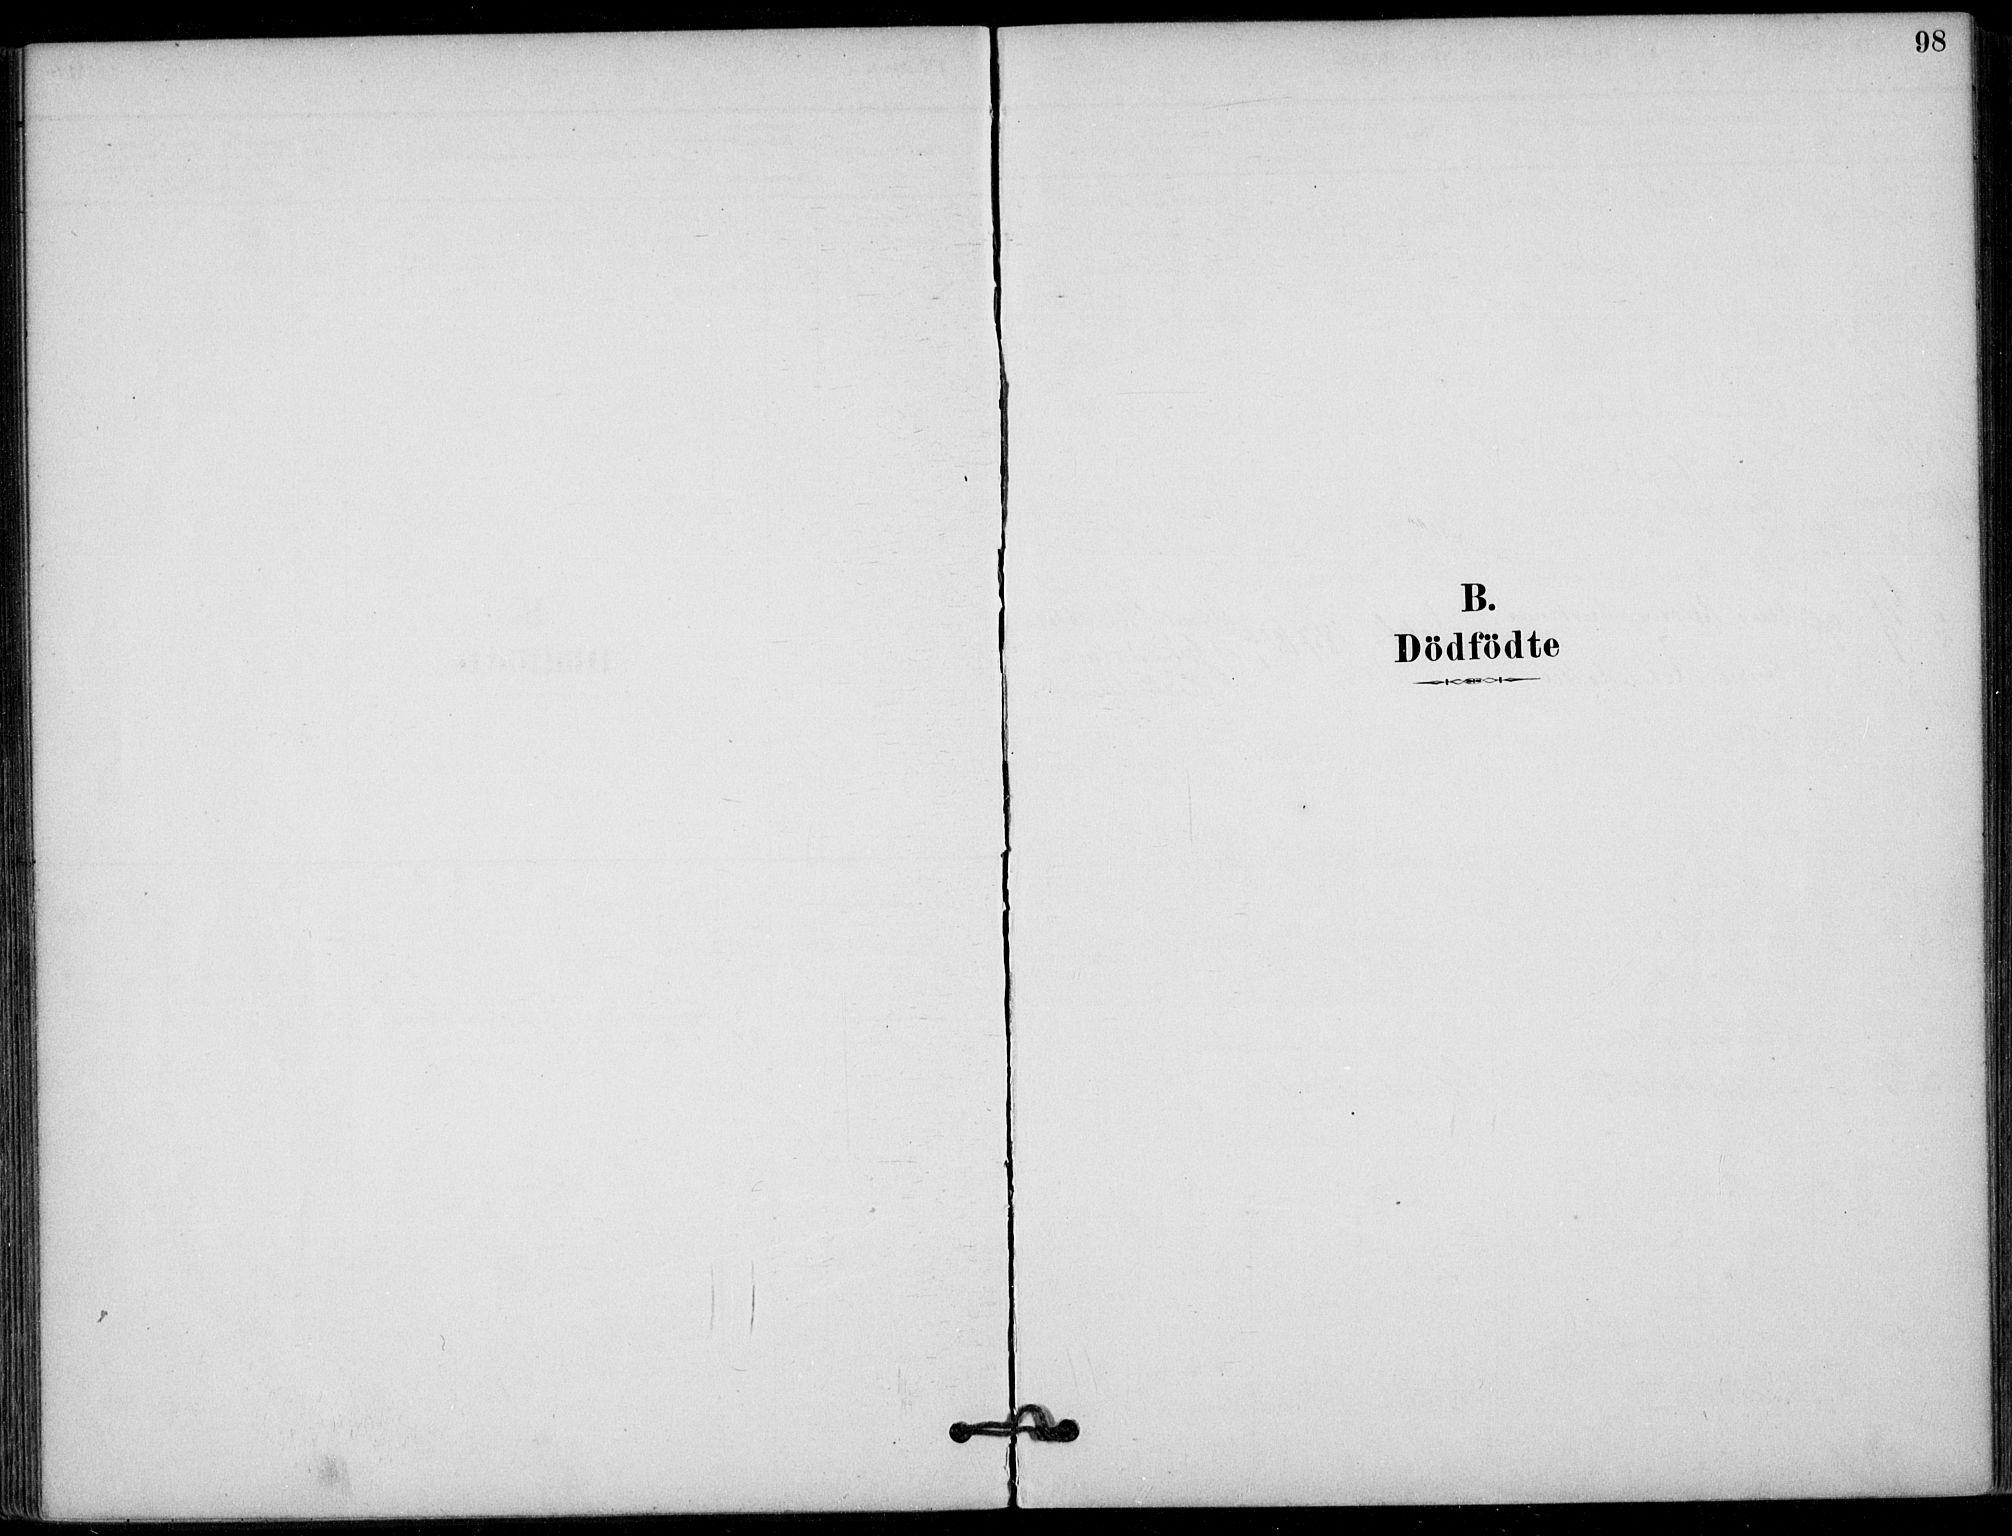 SAKO, Hjartdal kirkebøker, F/Fb/L0002: Ministerialbok nr. II 2, 1880-1932, s. 98